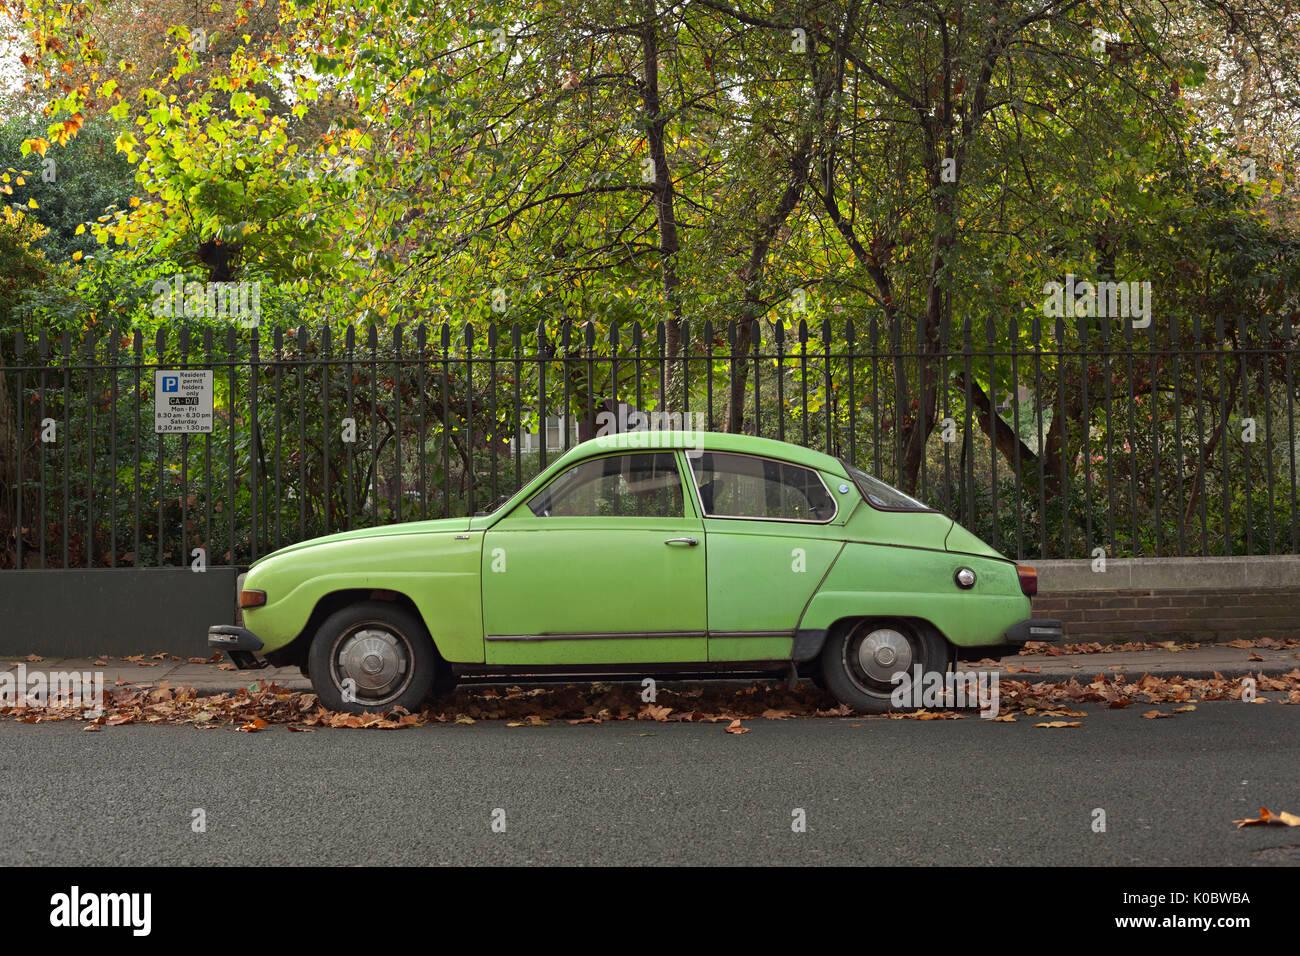 Green coloured Saab 96l at Gordon Square Gardens, London - Stock Image